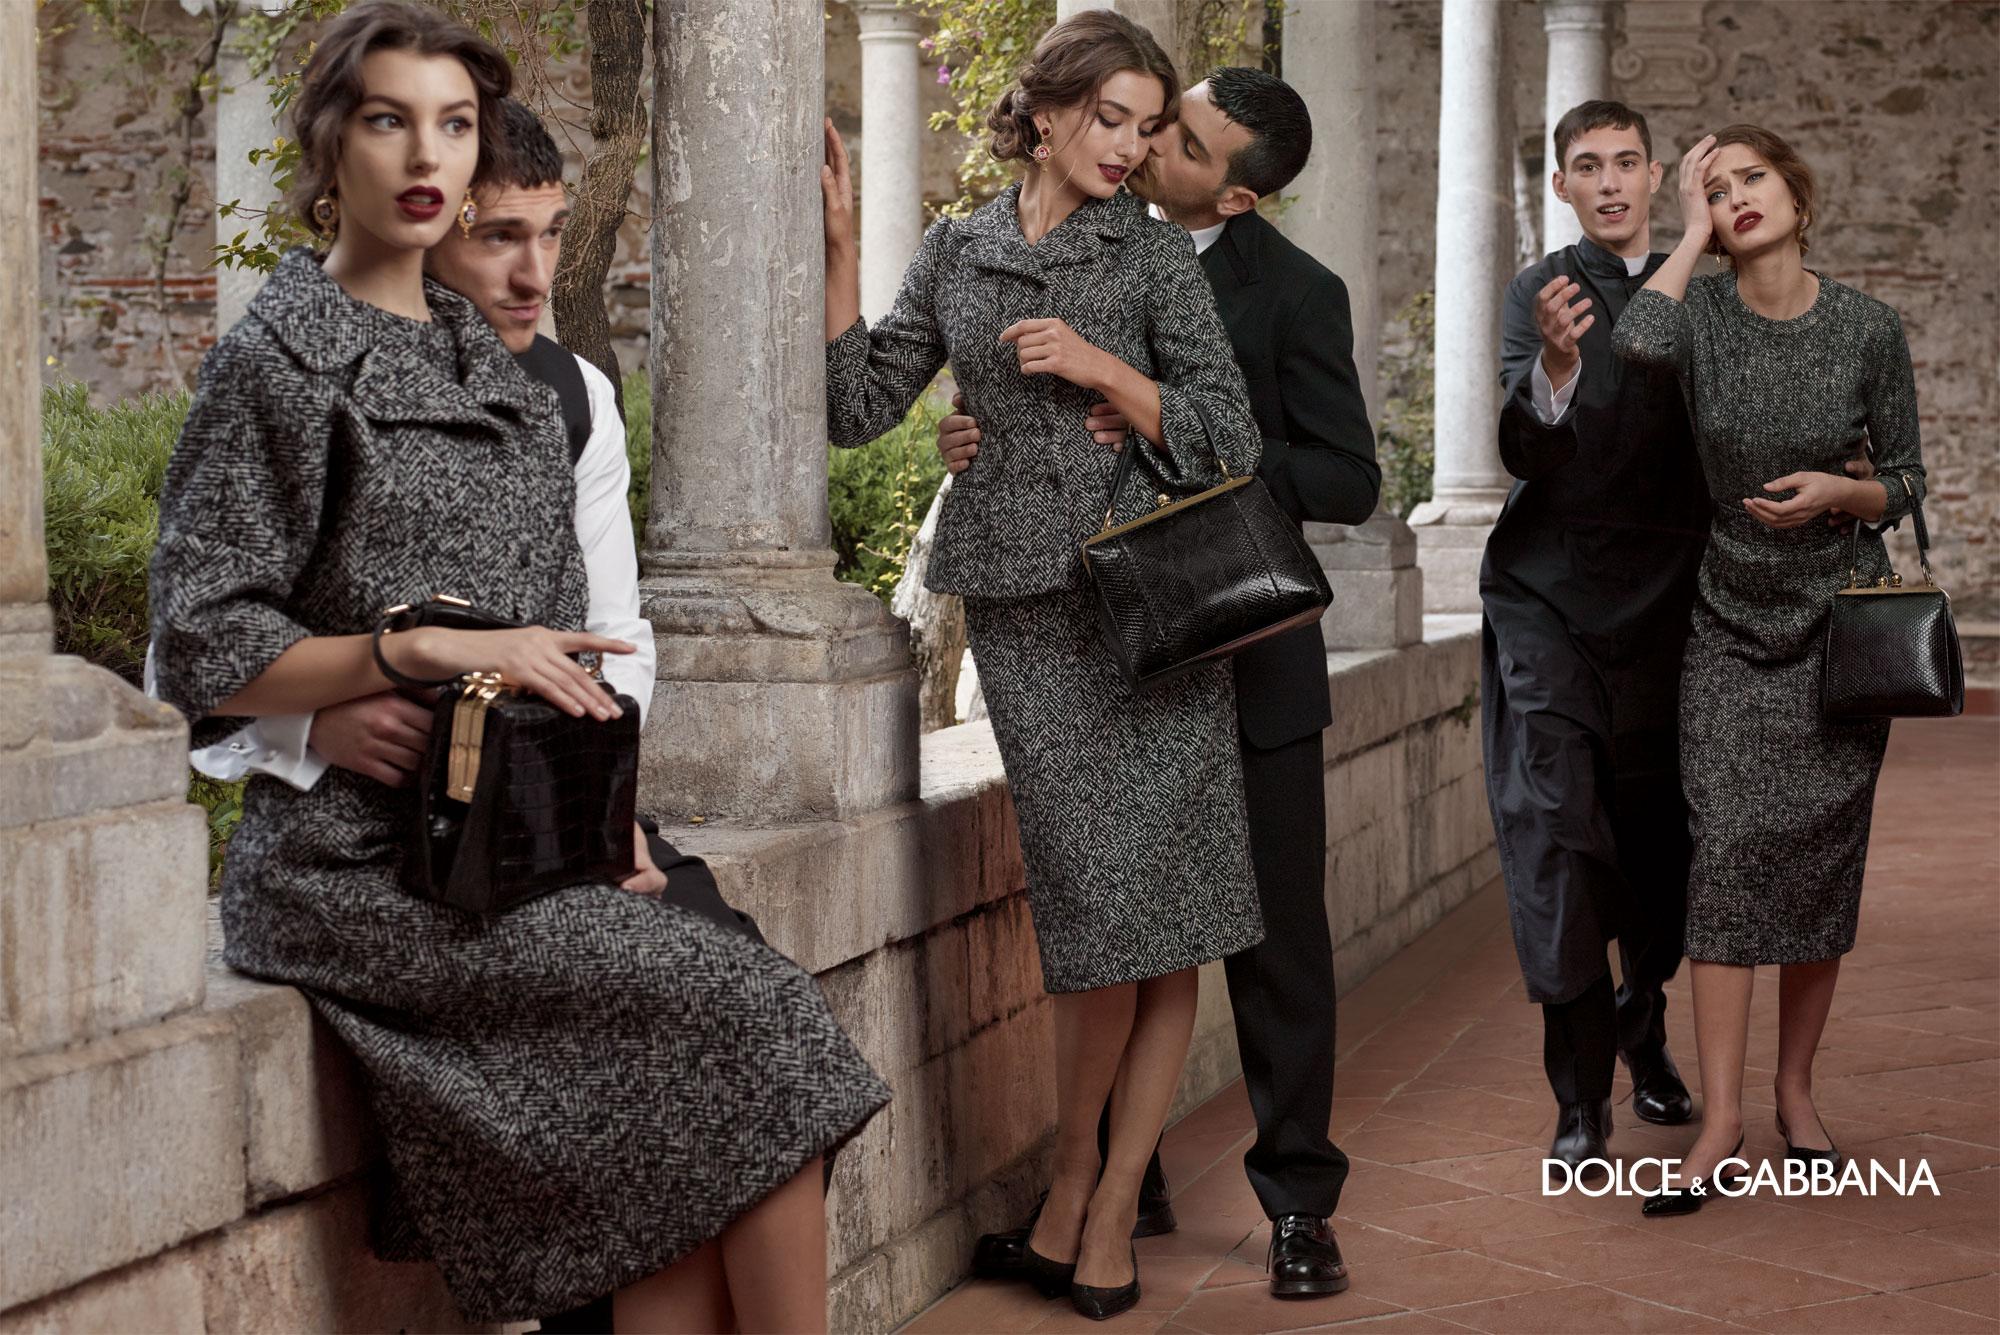 dolce-and-gabbana-fw-2014-women-adv-campaign-1